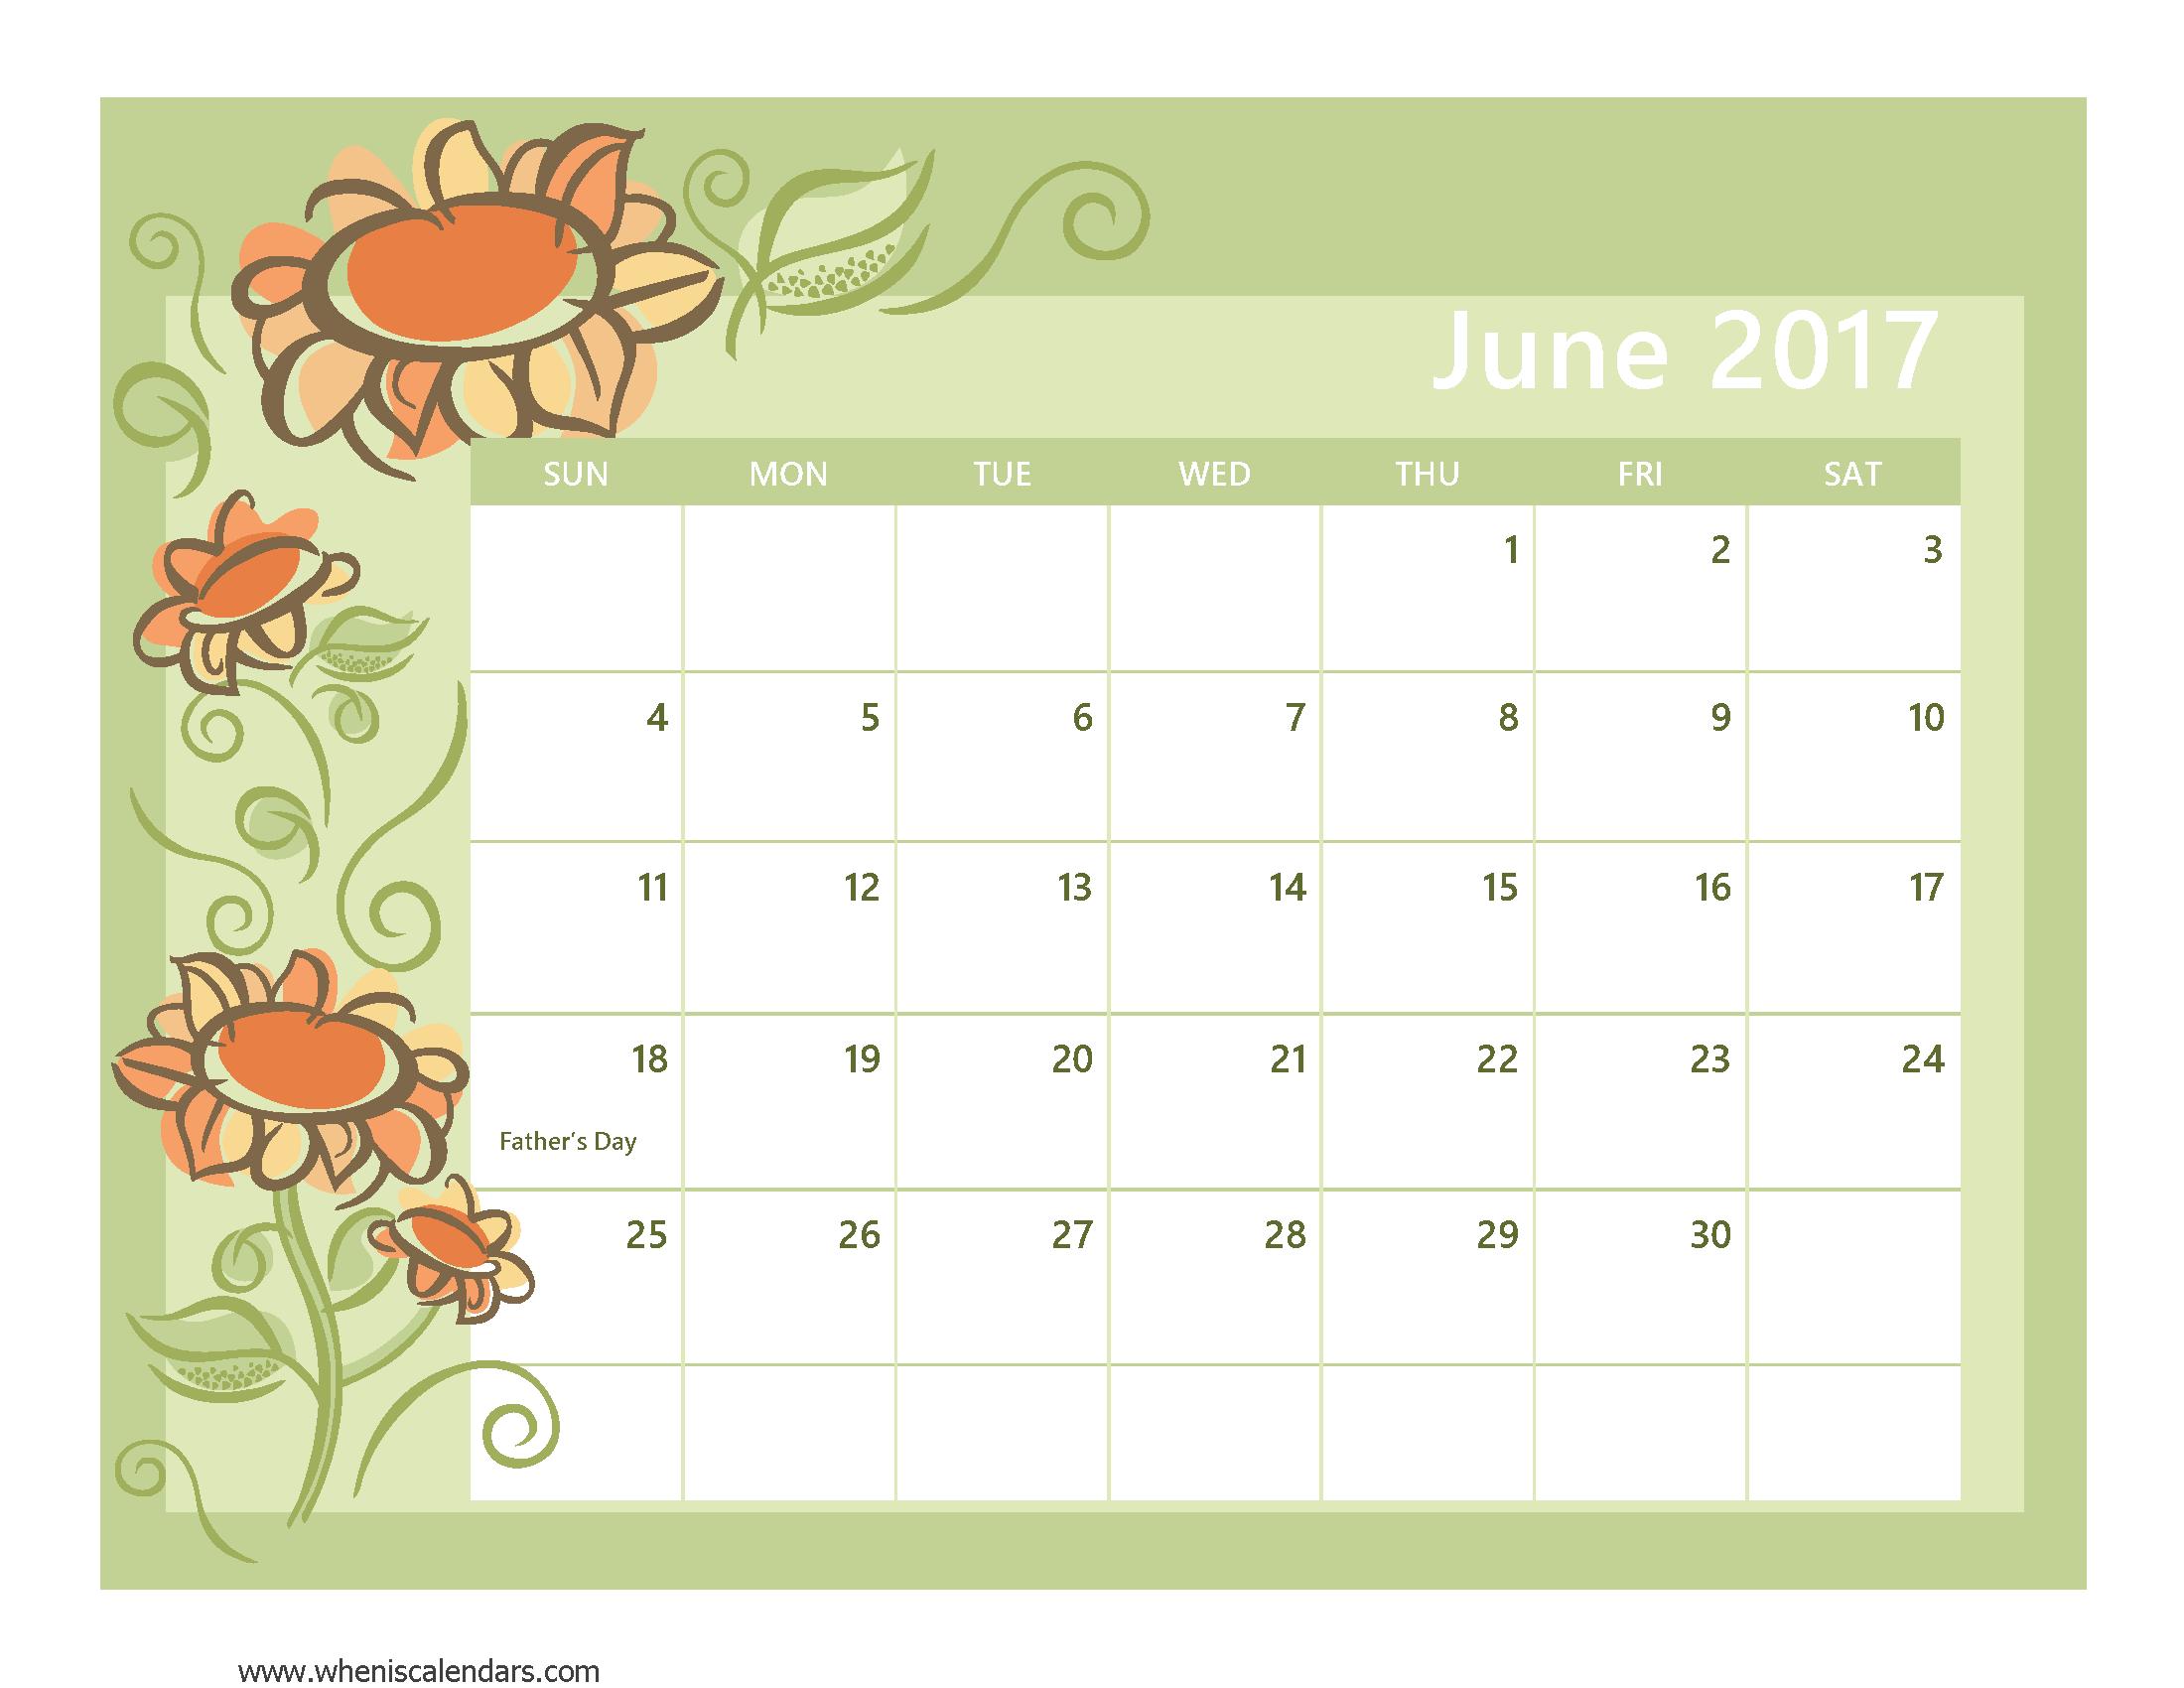 June 2017 Calendar With US Holidays